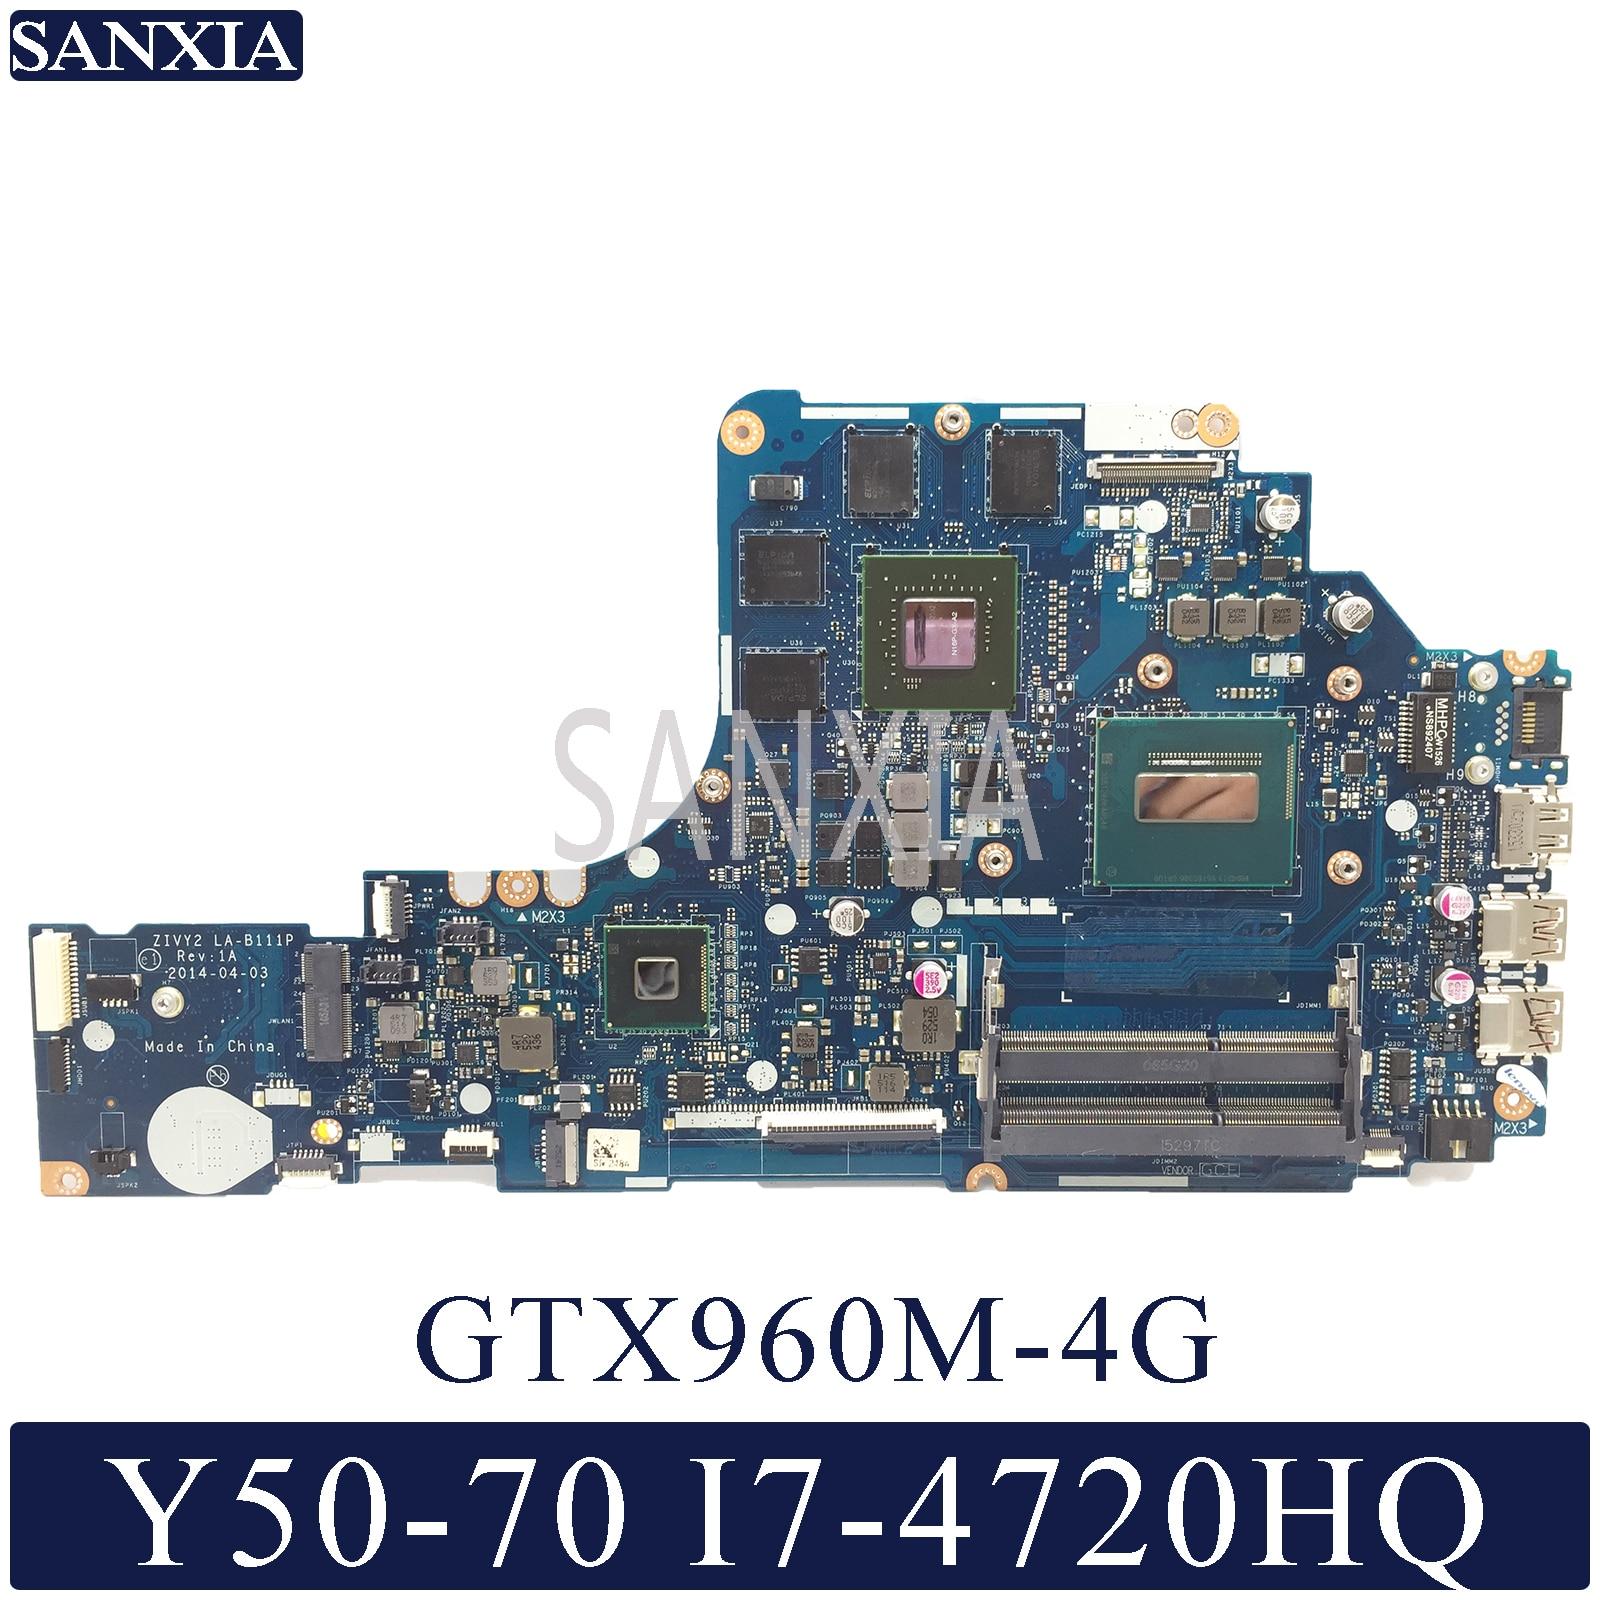 KEFU LA-B111P Laptop Motherboard For Lenovo Y50-70 Original Mainboard I7-4720HQ/4710HQ GTX960M-4G